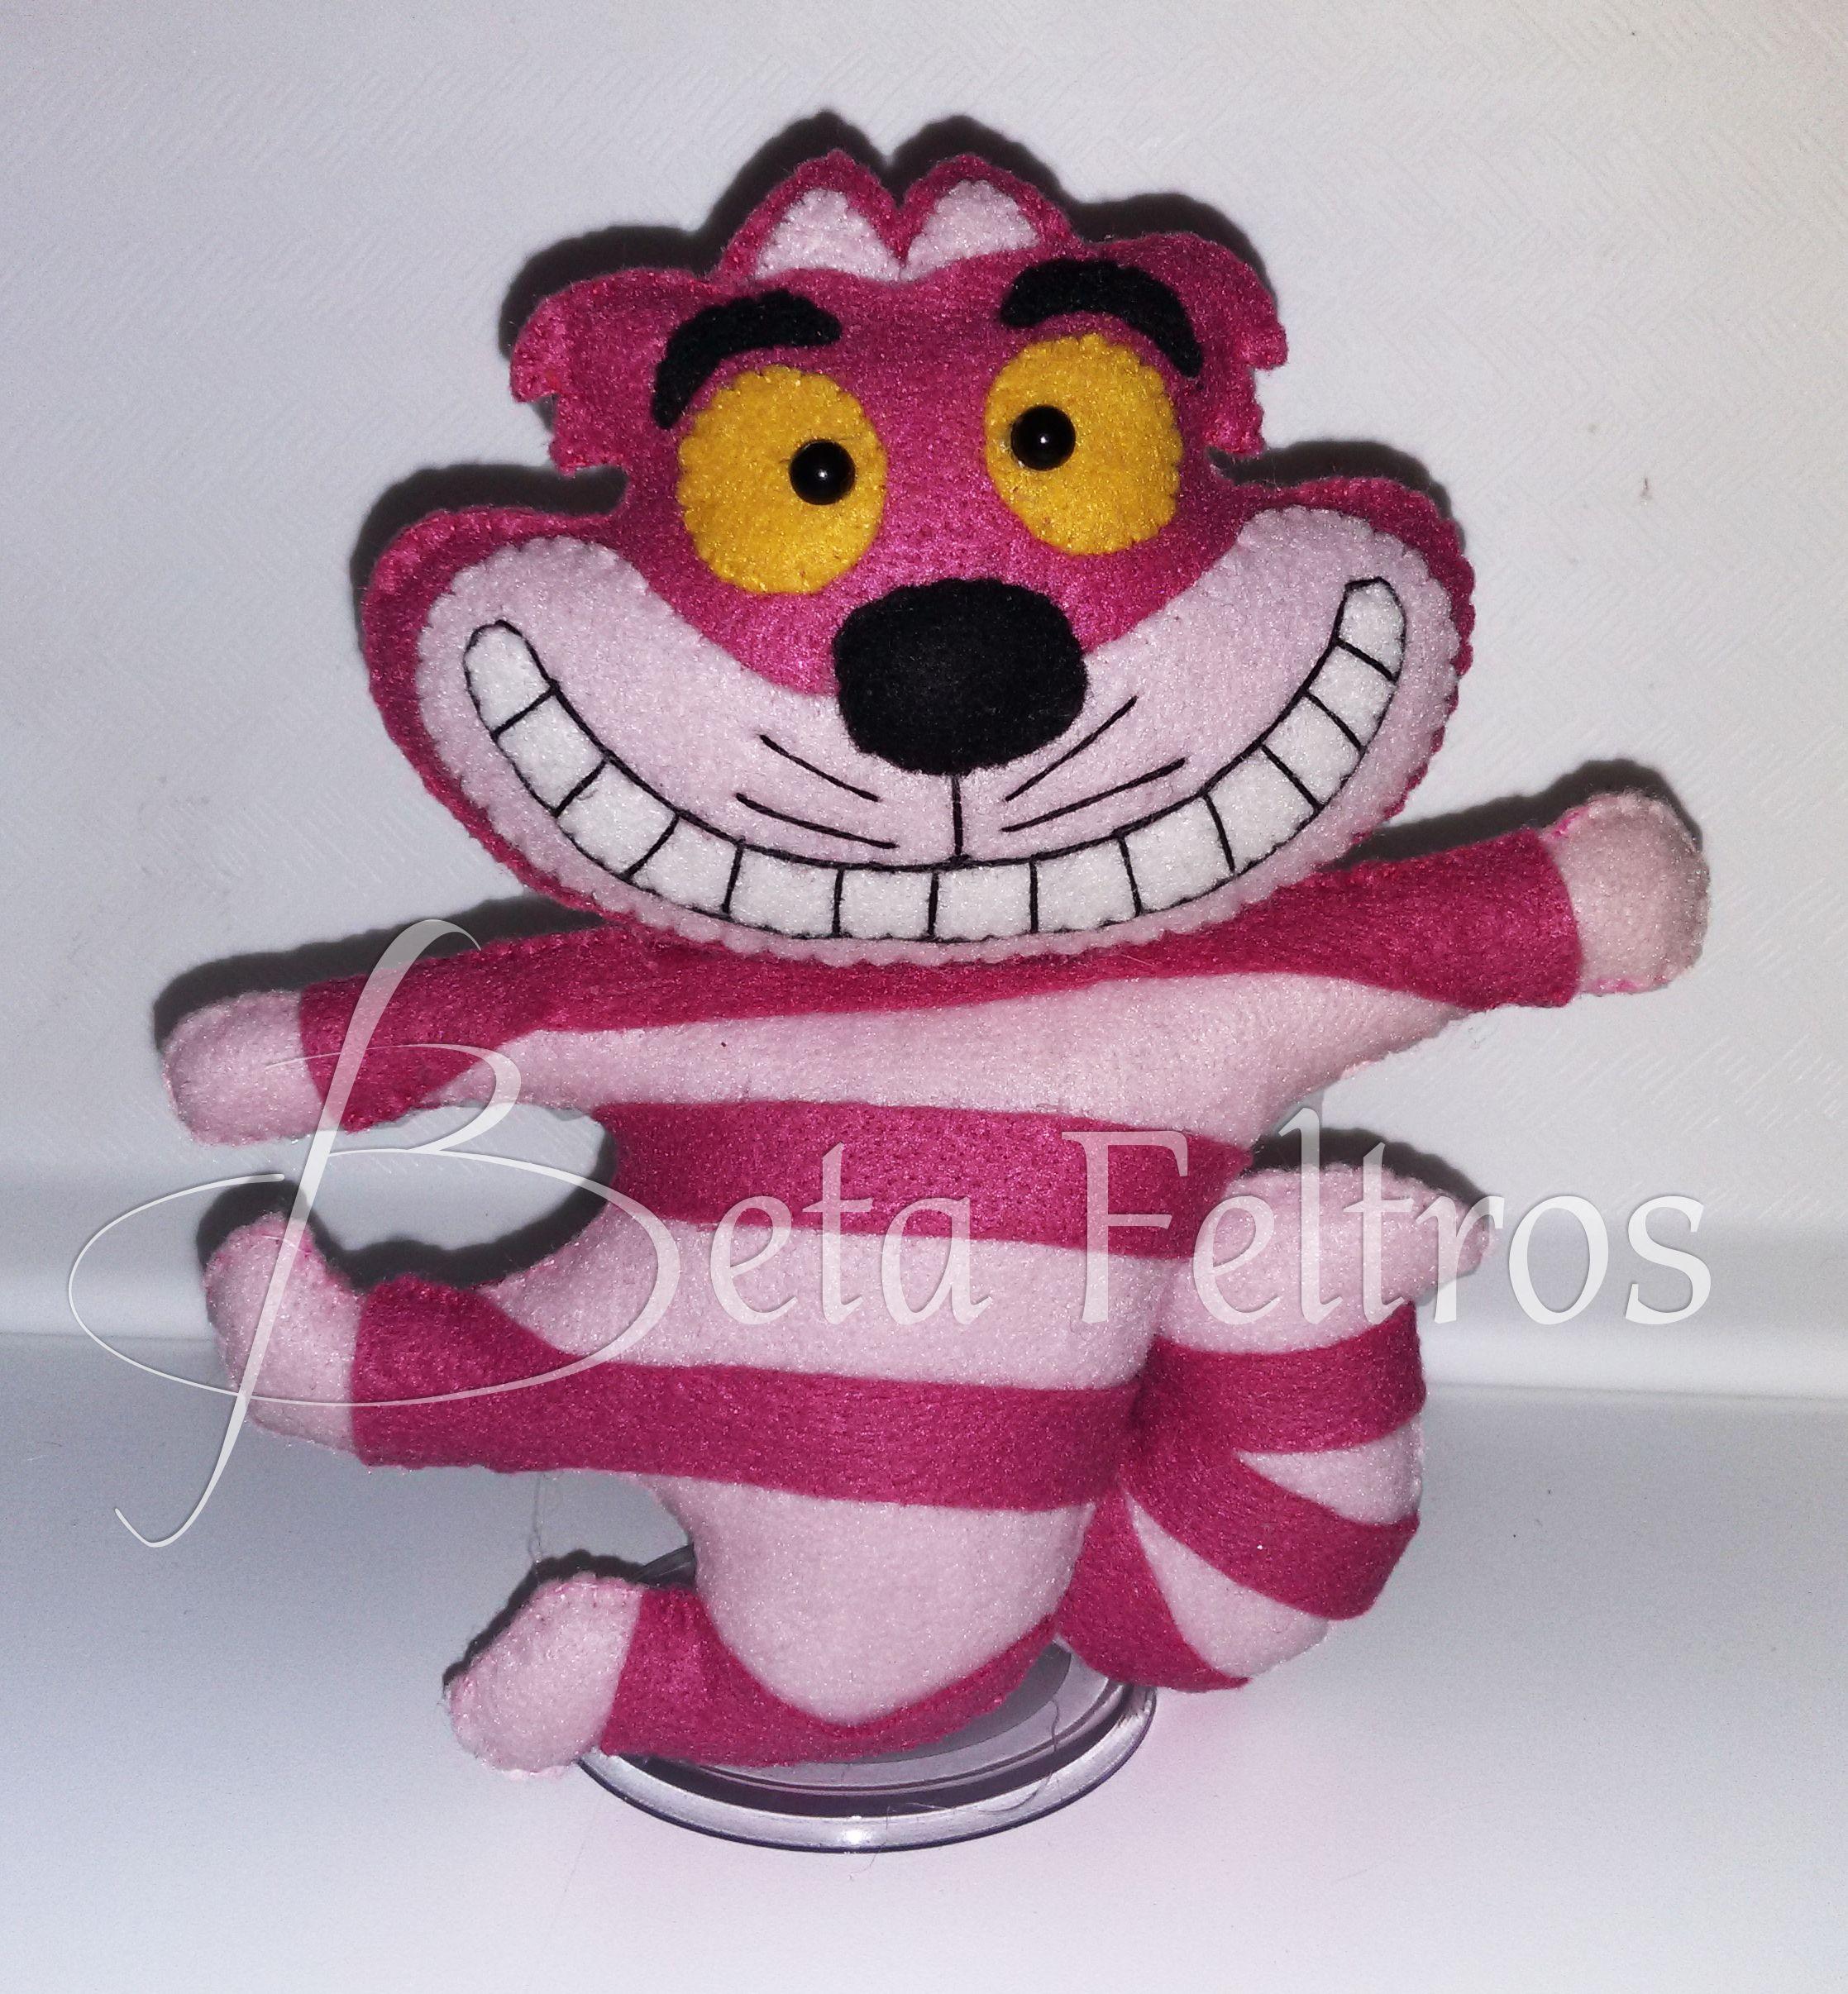 Gato Cheshire Feltro #gato #cheshire #alice #feltro #felt #betafeltros